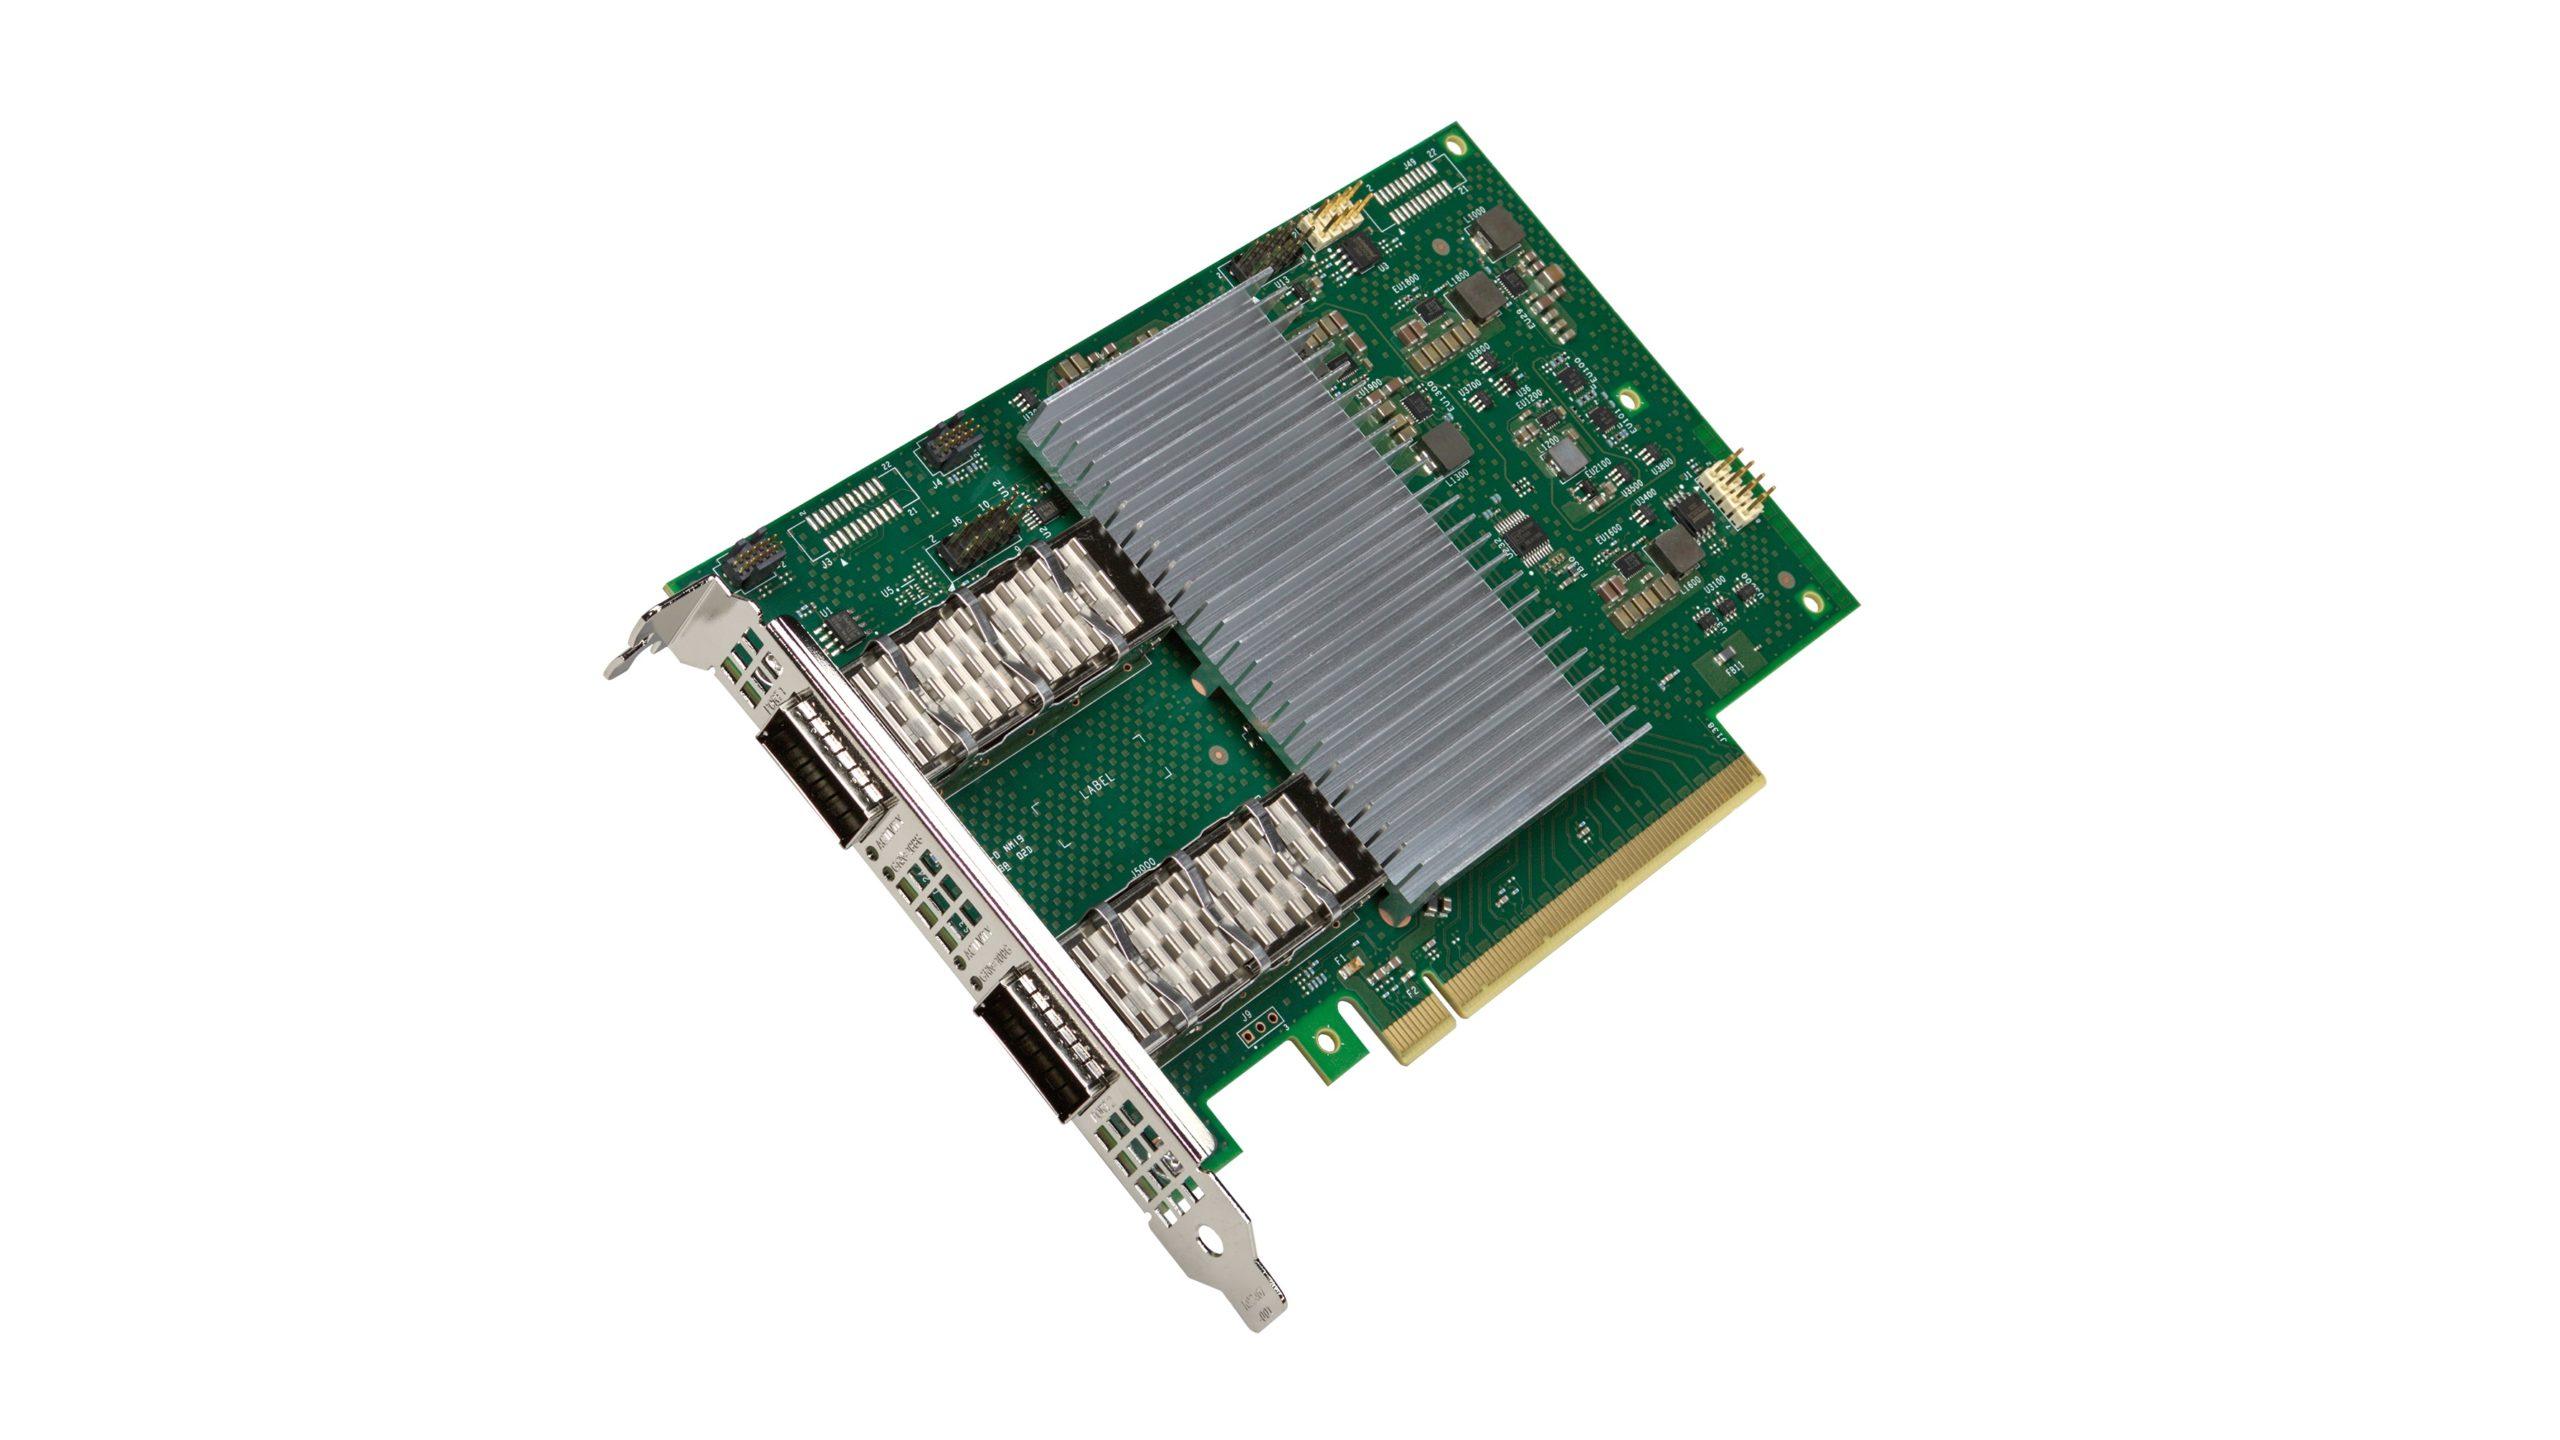 Intel-Ethernet-Network-Adapter-ED810-2CQDA2